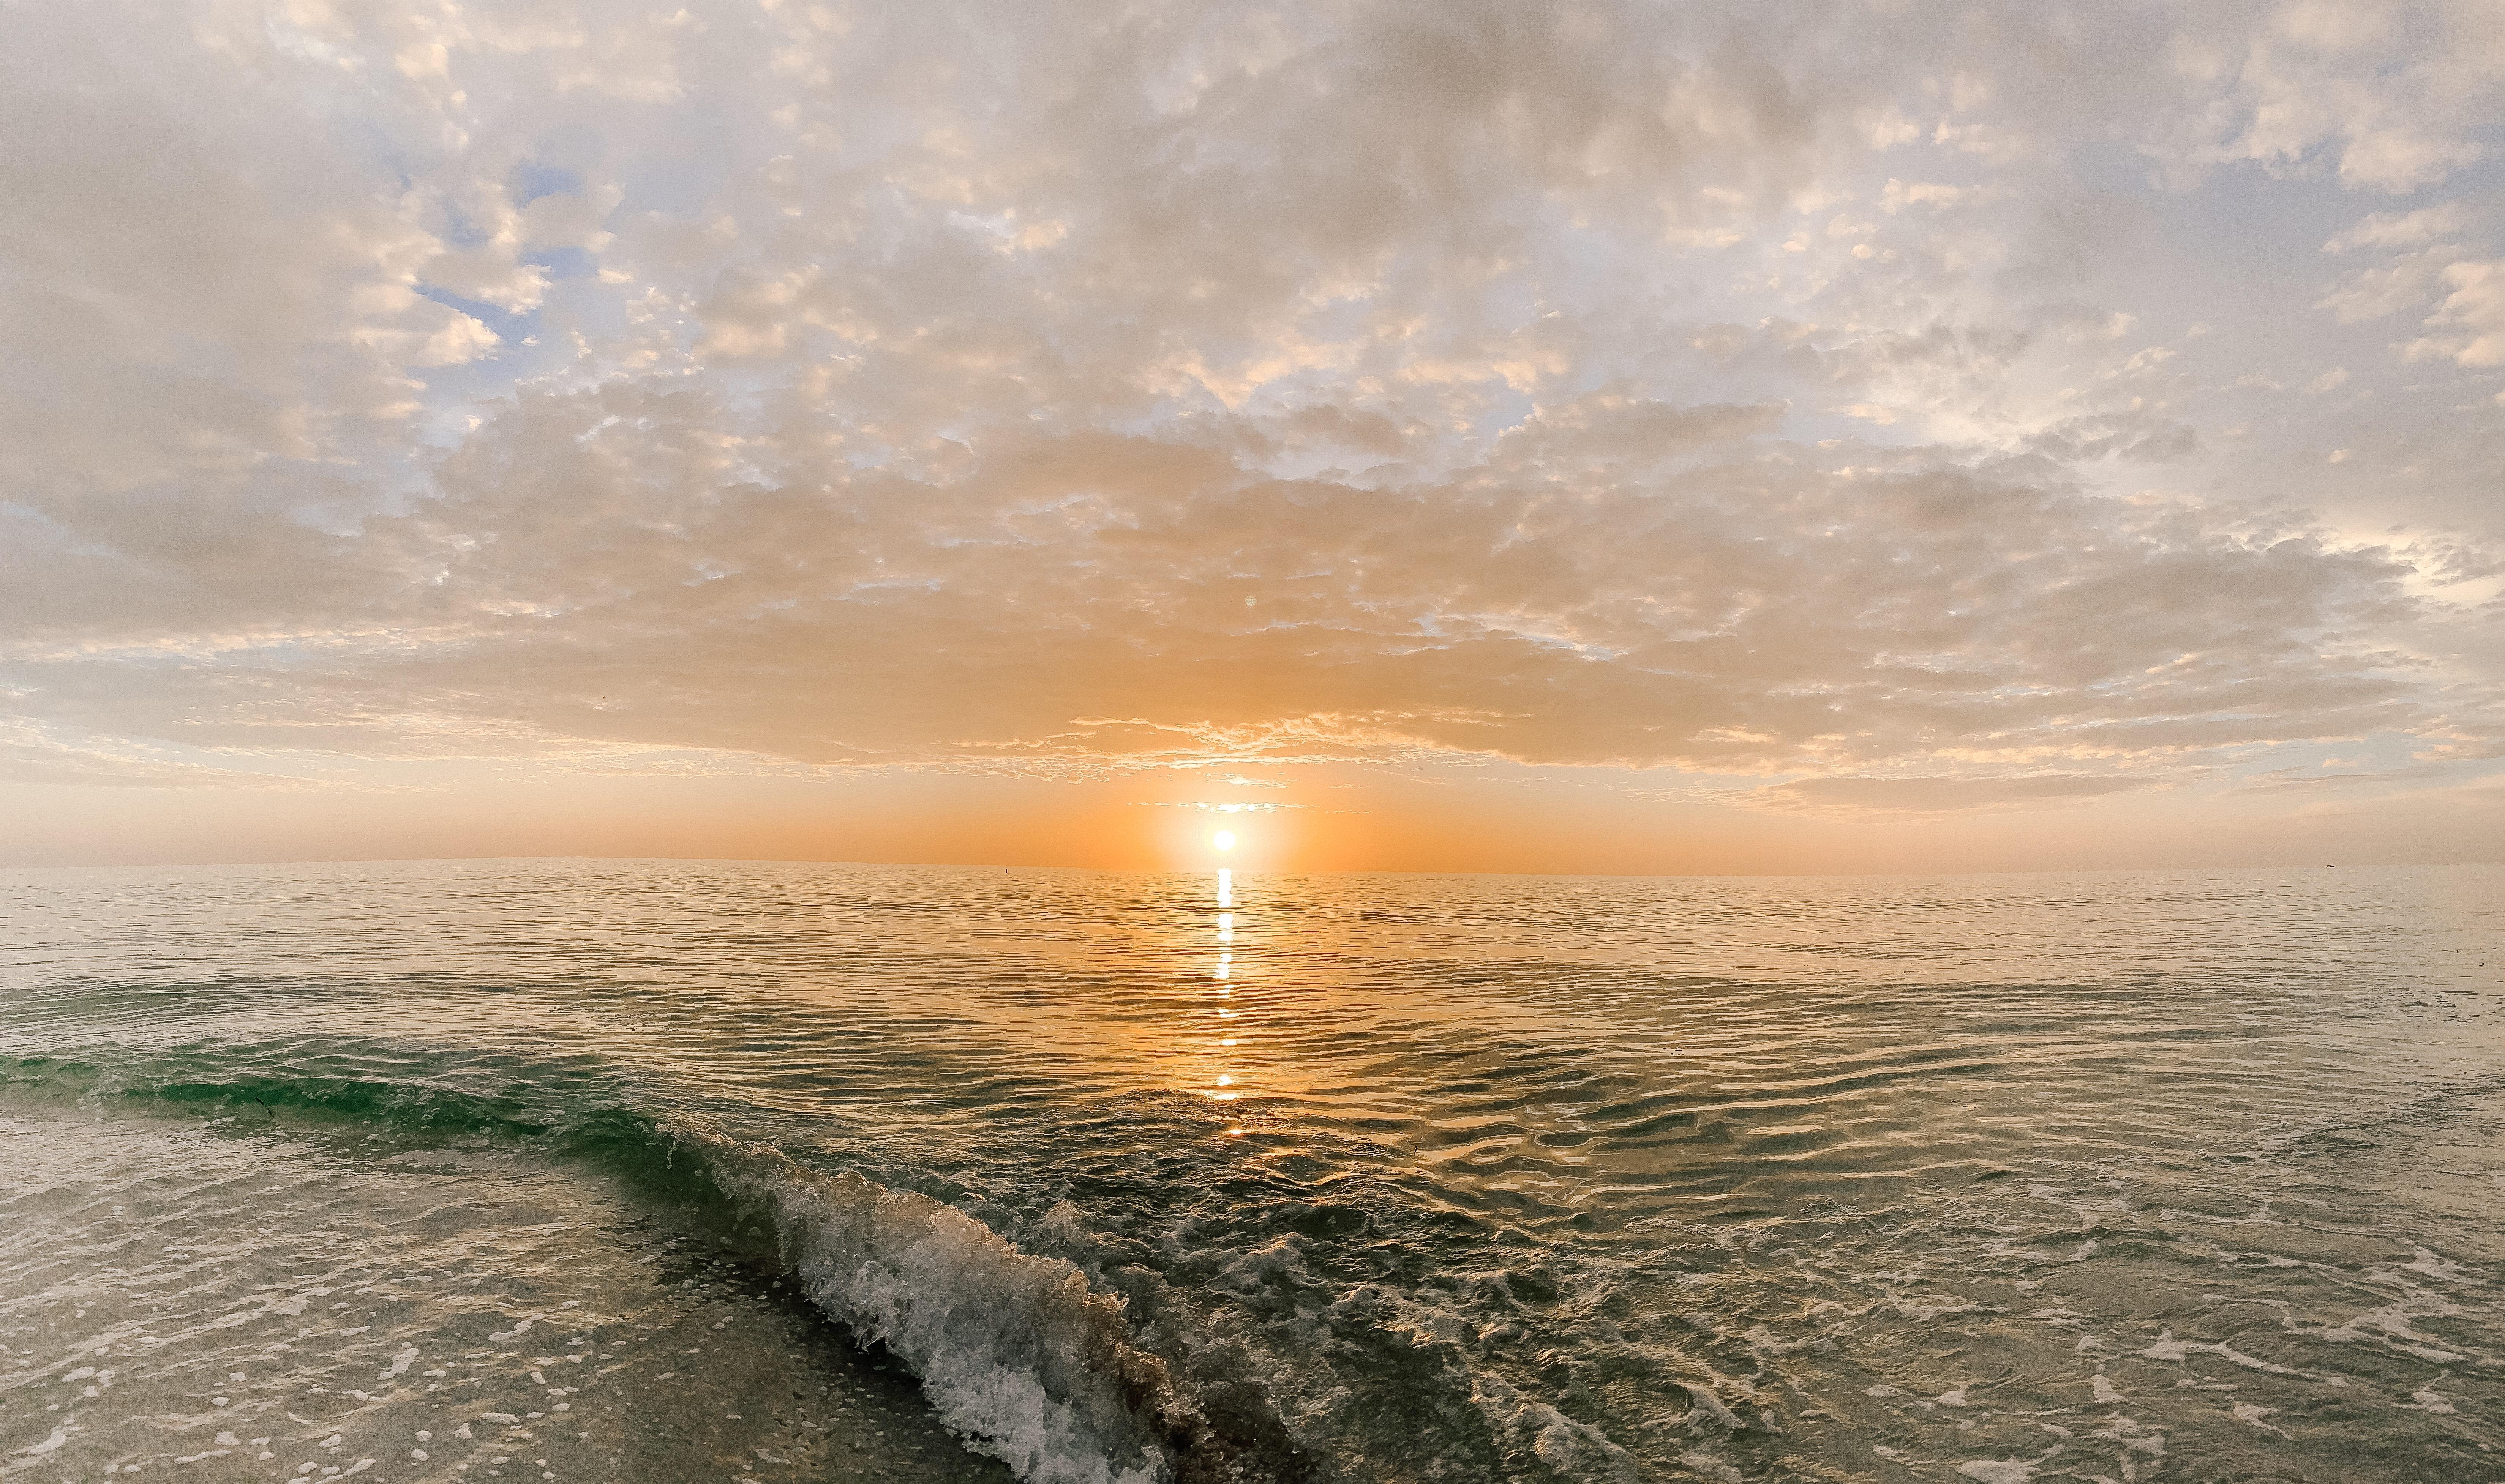 Sunset SHELLebration at South Seas